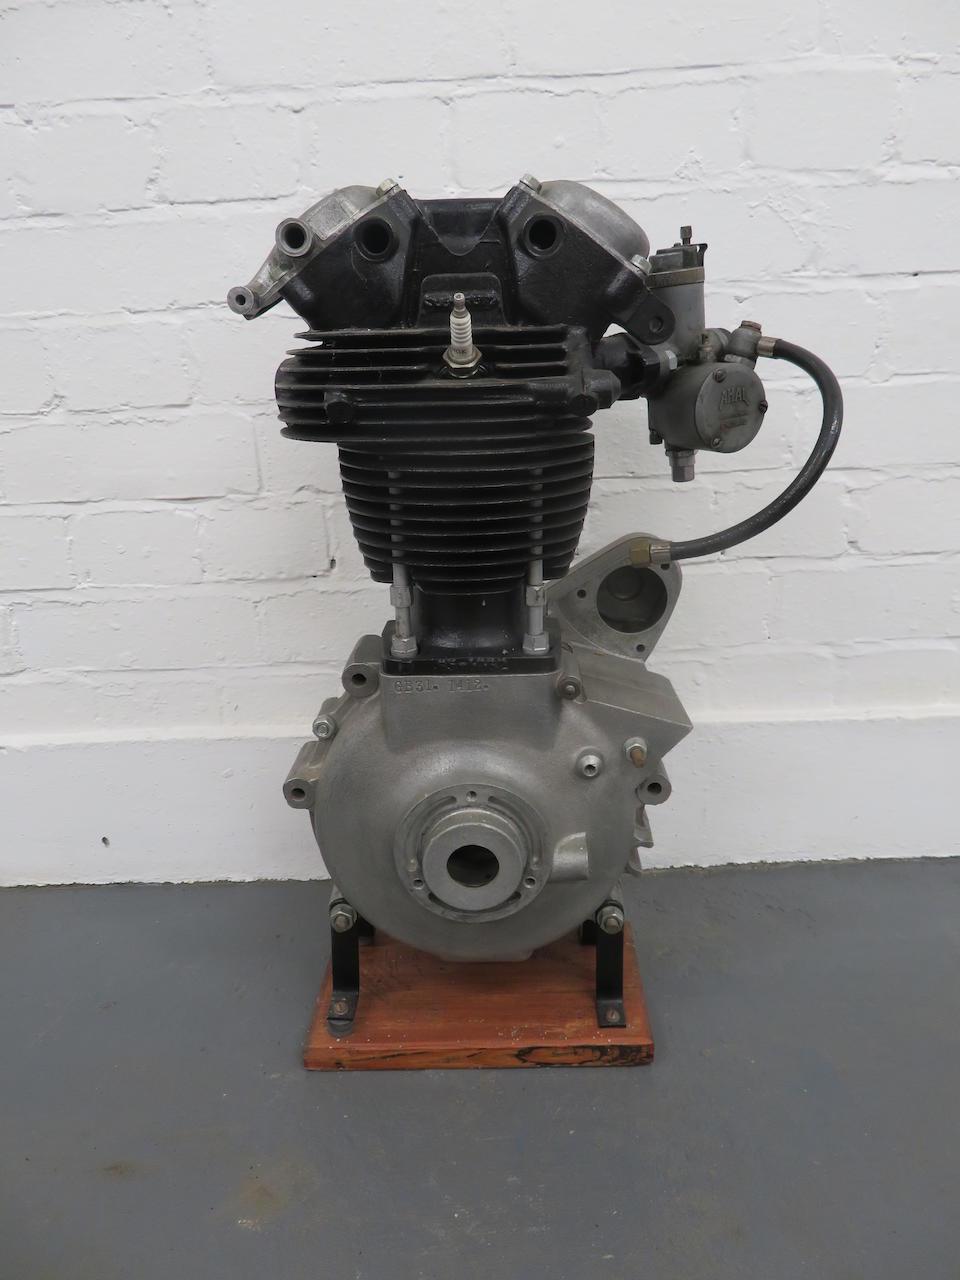 A BSA B31 Display engine